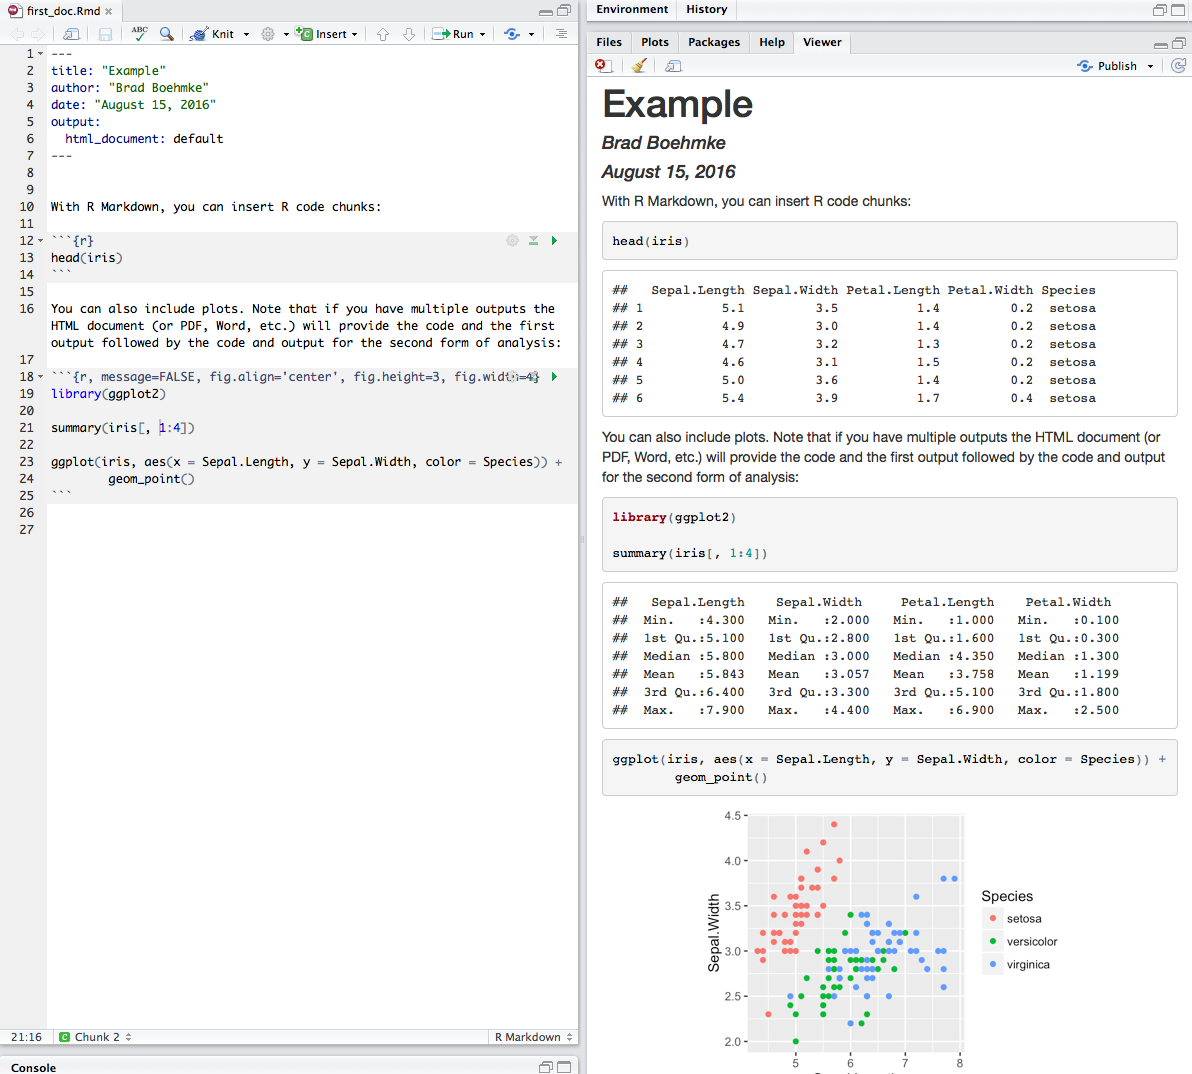 R Markdown · AFIT Data Science Lab R Programming Guide